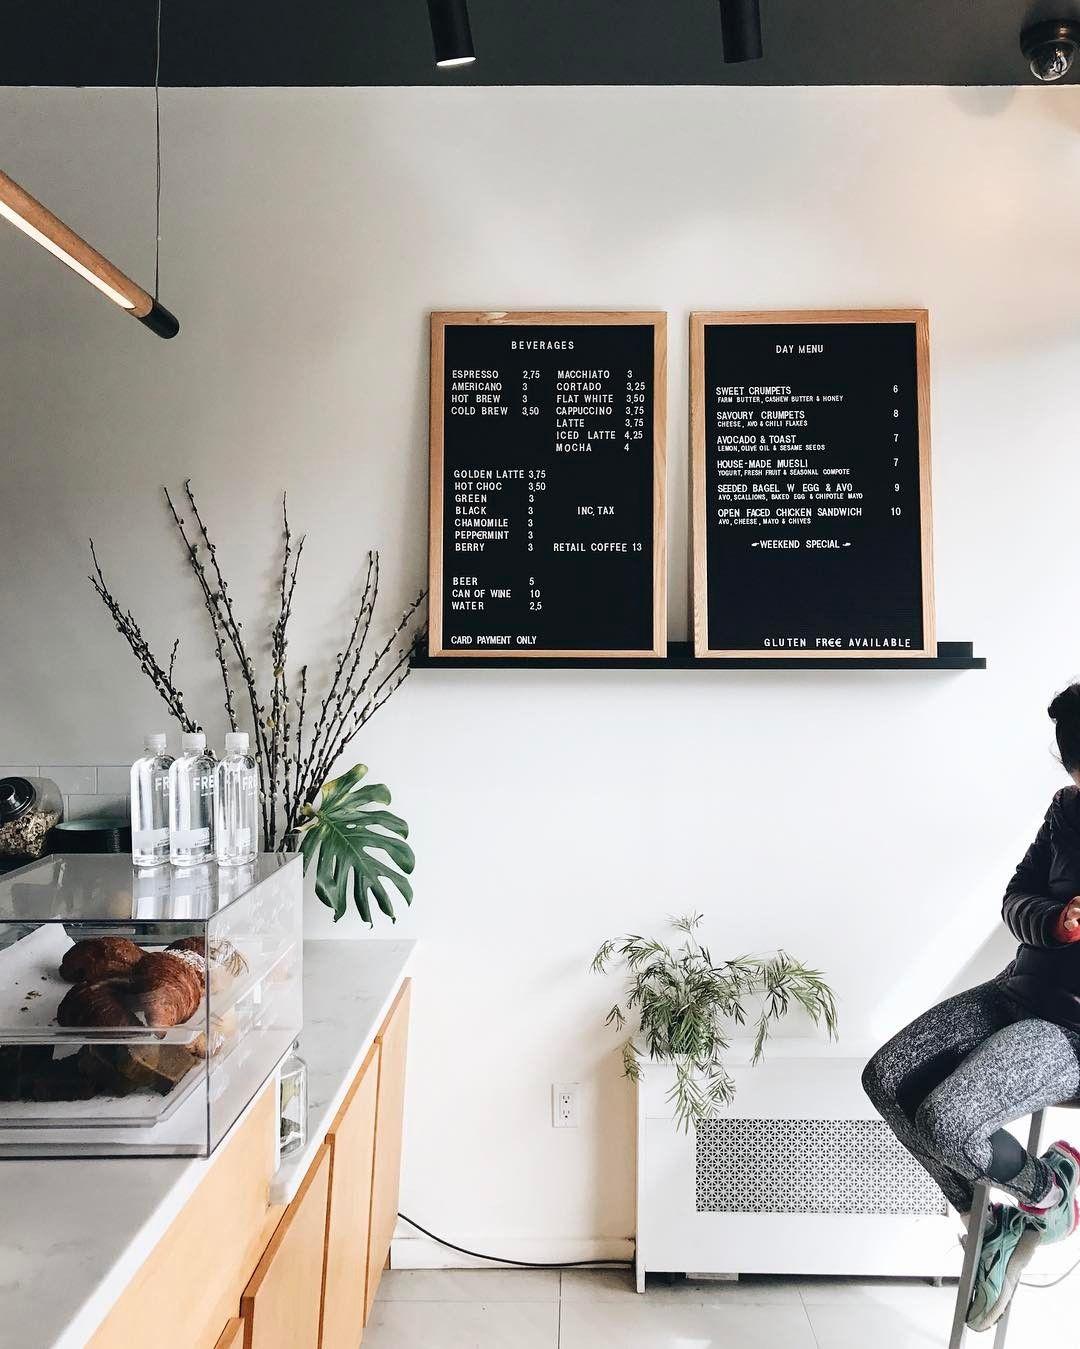 Three Seat Espresso & Barber, New York Photo: Dianne Elizabeth #cafe ...